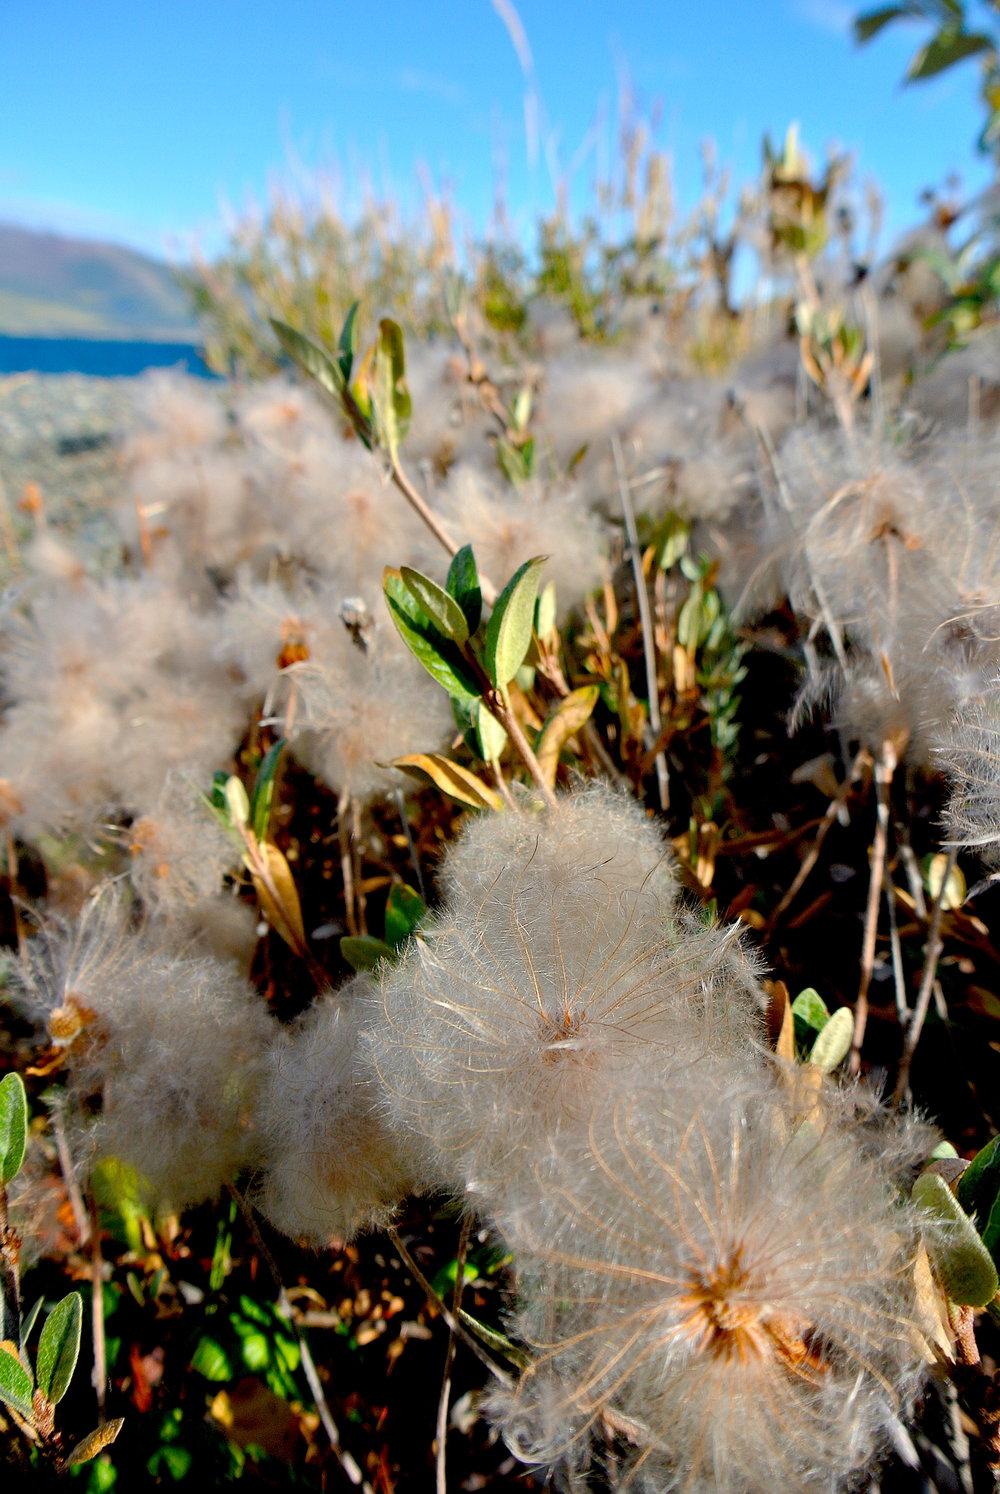 Fuzzy Plants near Congdon Creek Camp